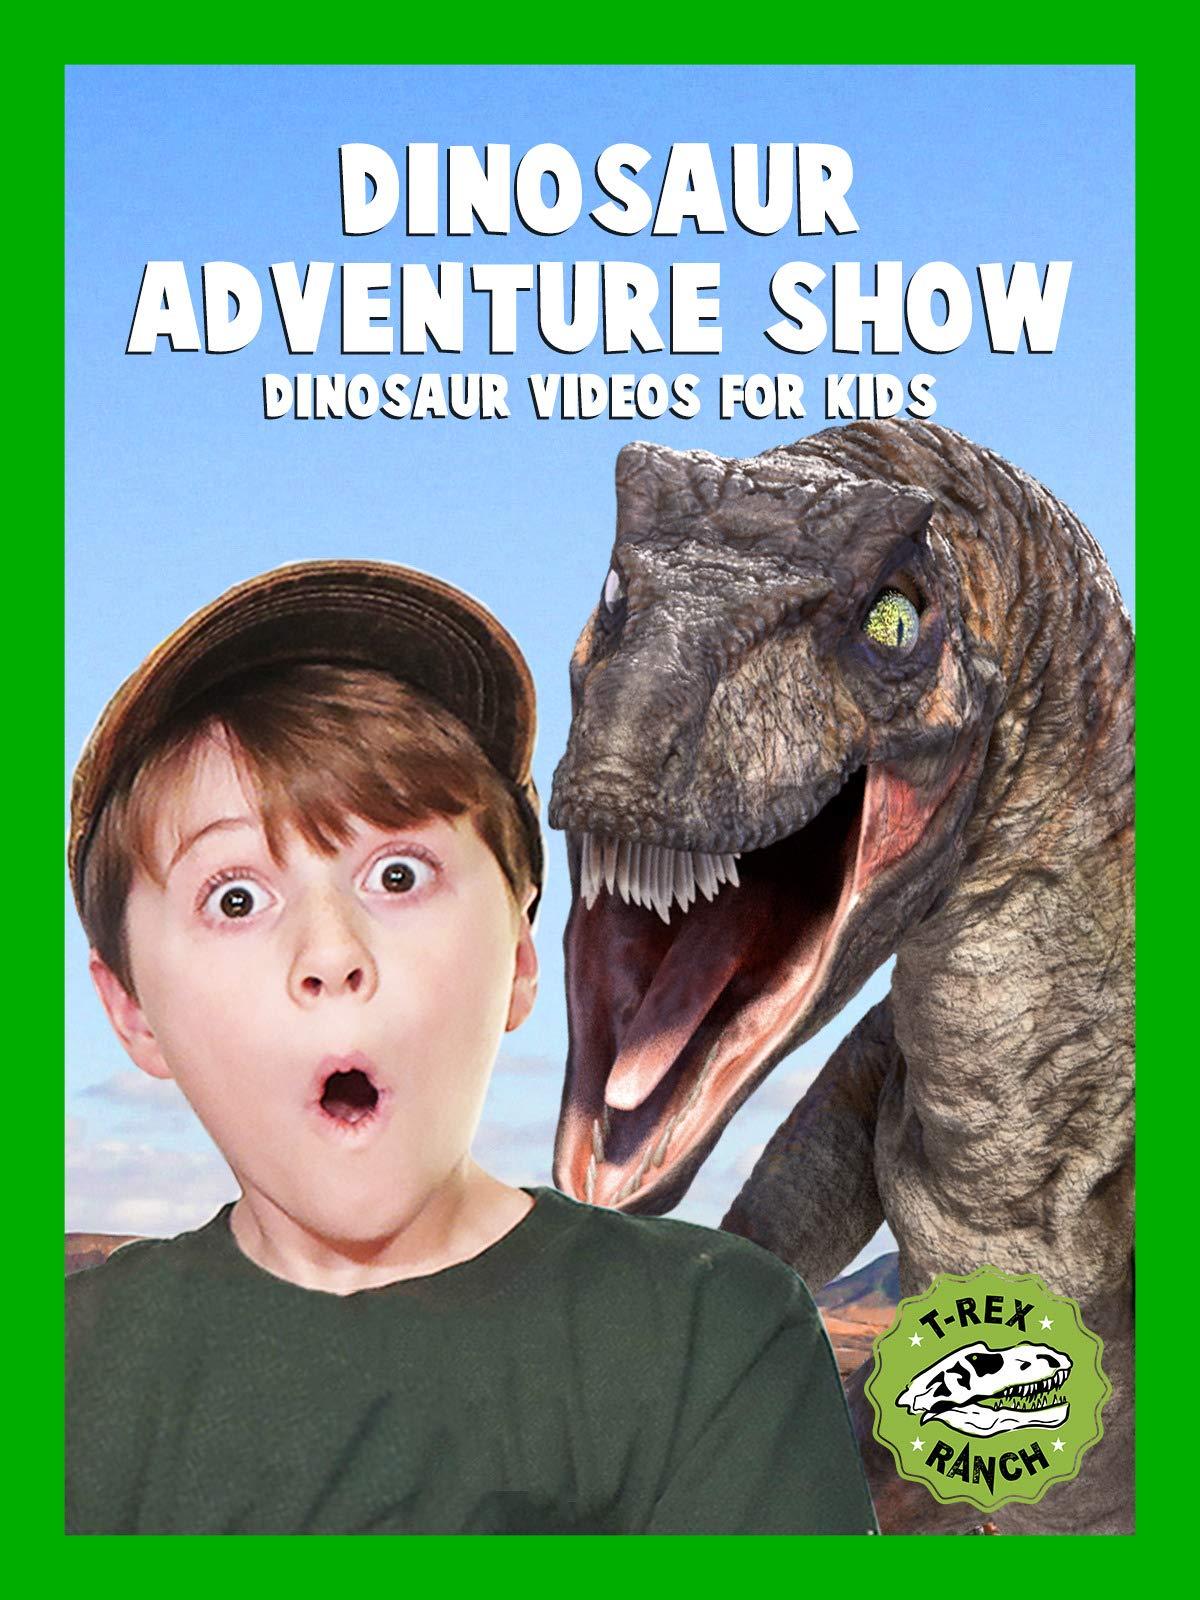 T-Rex Ranch - Dinosaur Adventure Show - Dinosaur Videos for Kids